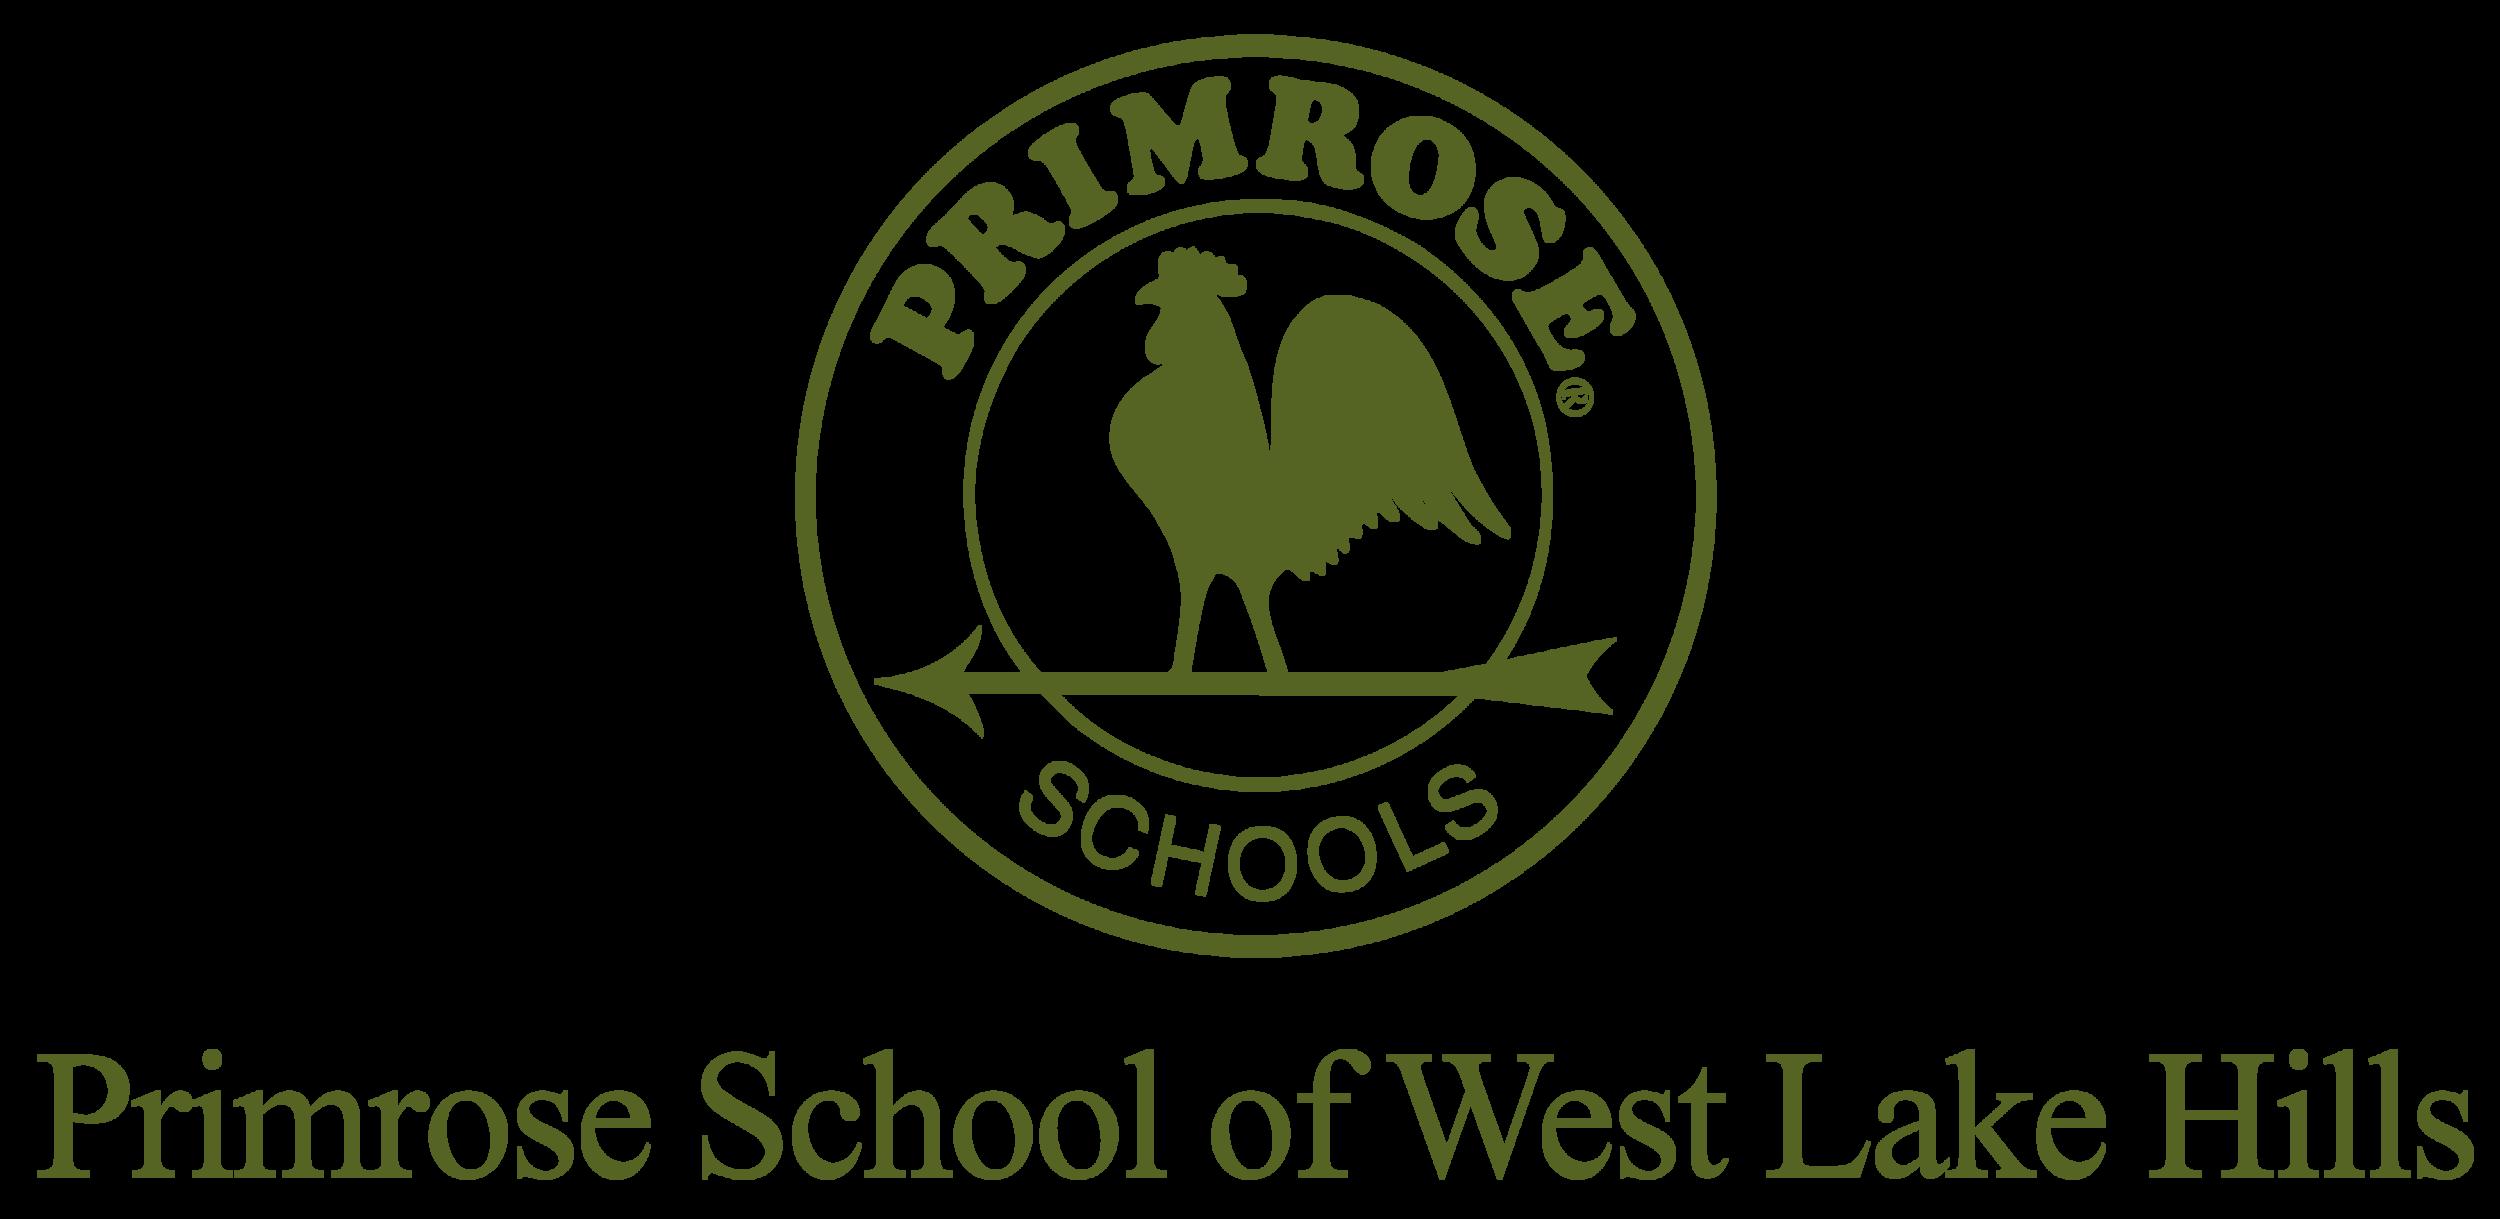 Primrose_WestLakeHills_V_green.png